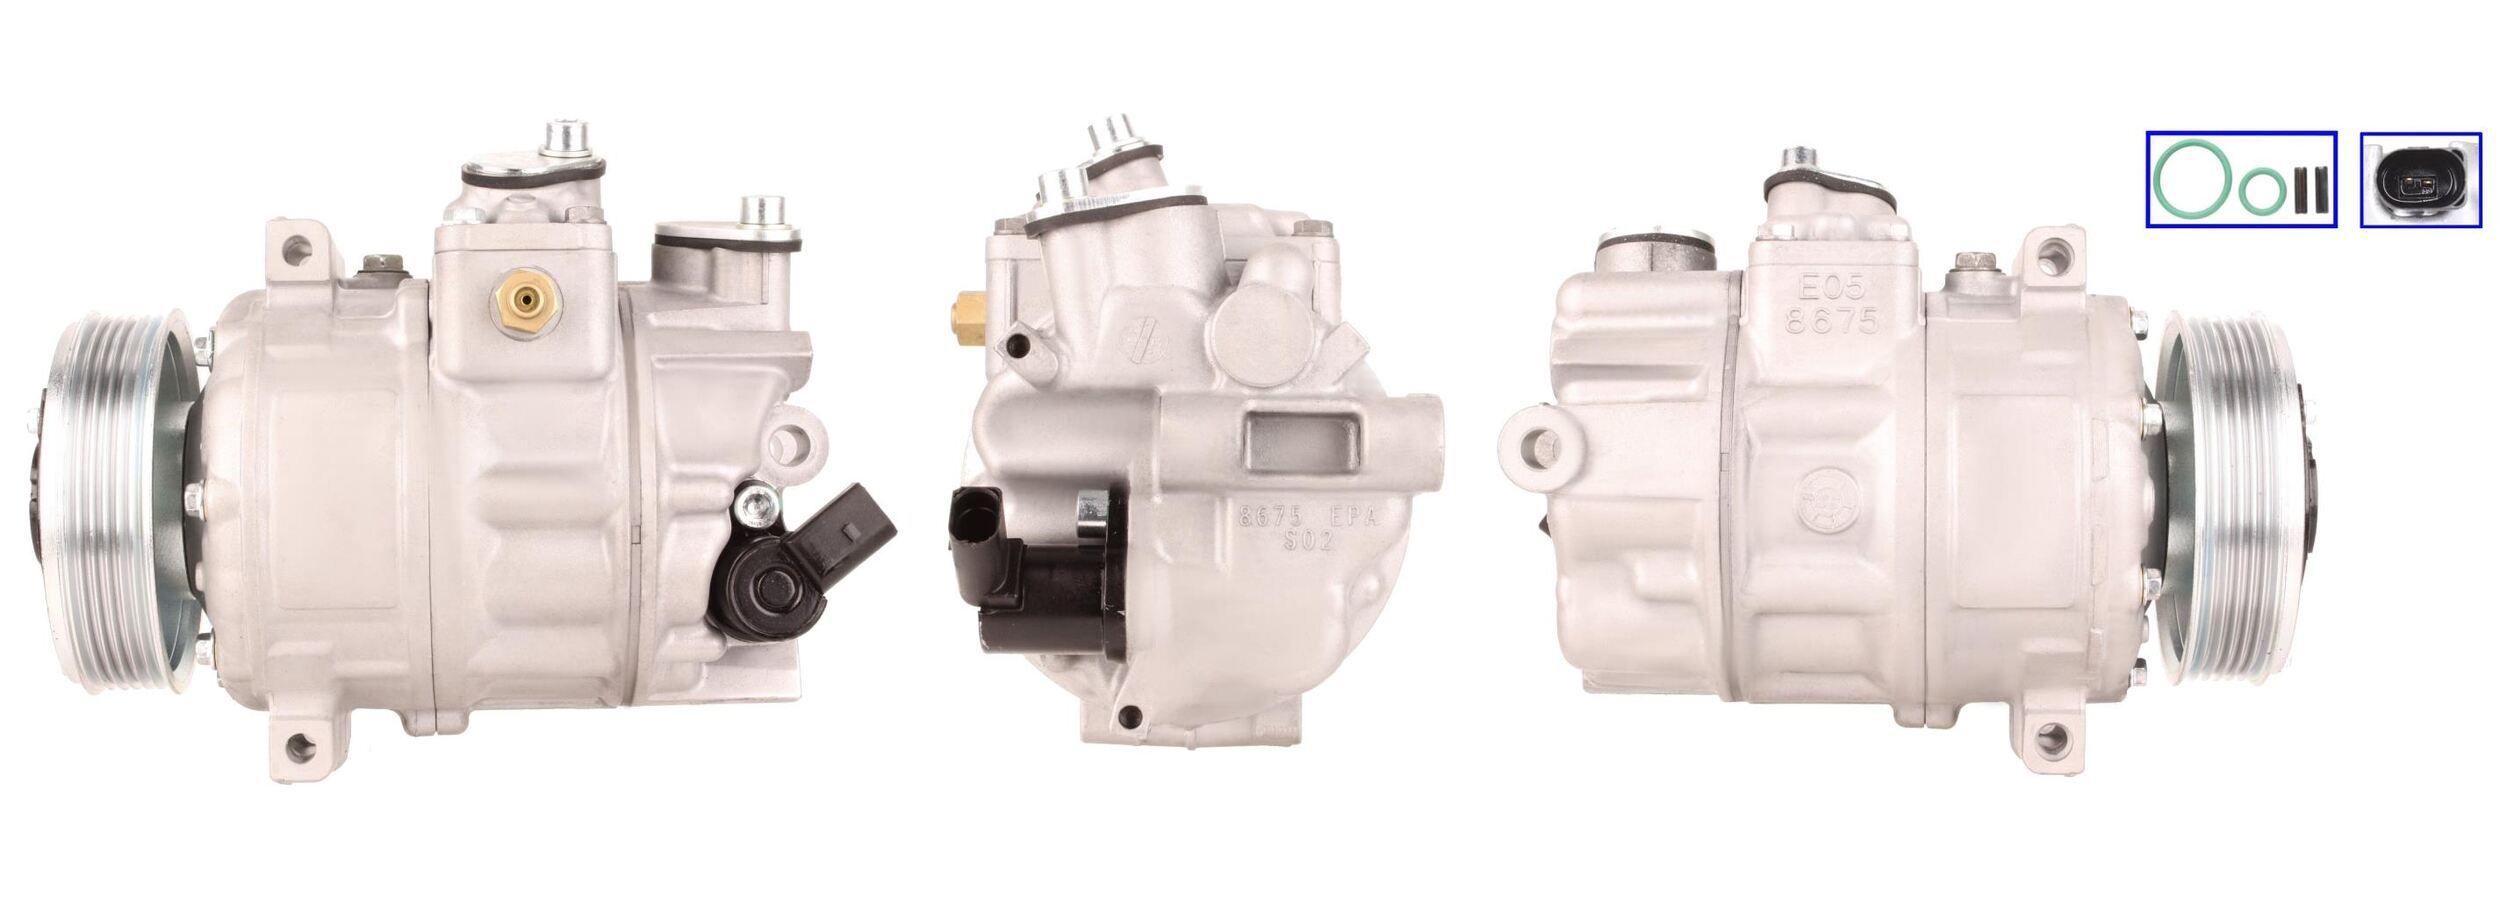 Klimakompressor ELSTOCK 51-0123